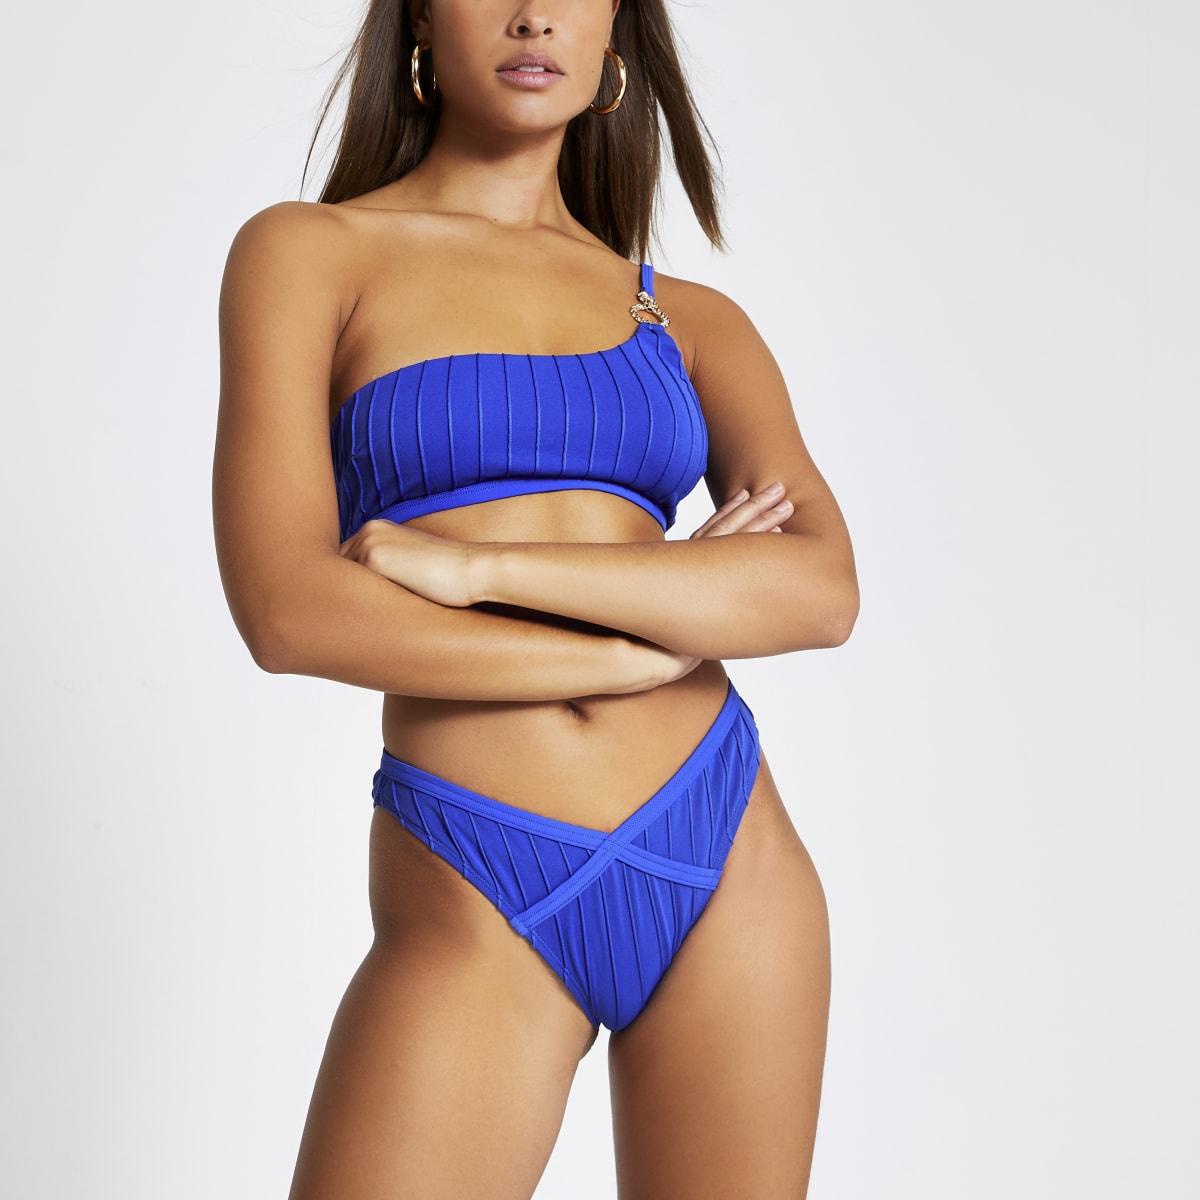 Blauw geribbeld hoogopgesneden bikinibroekje